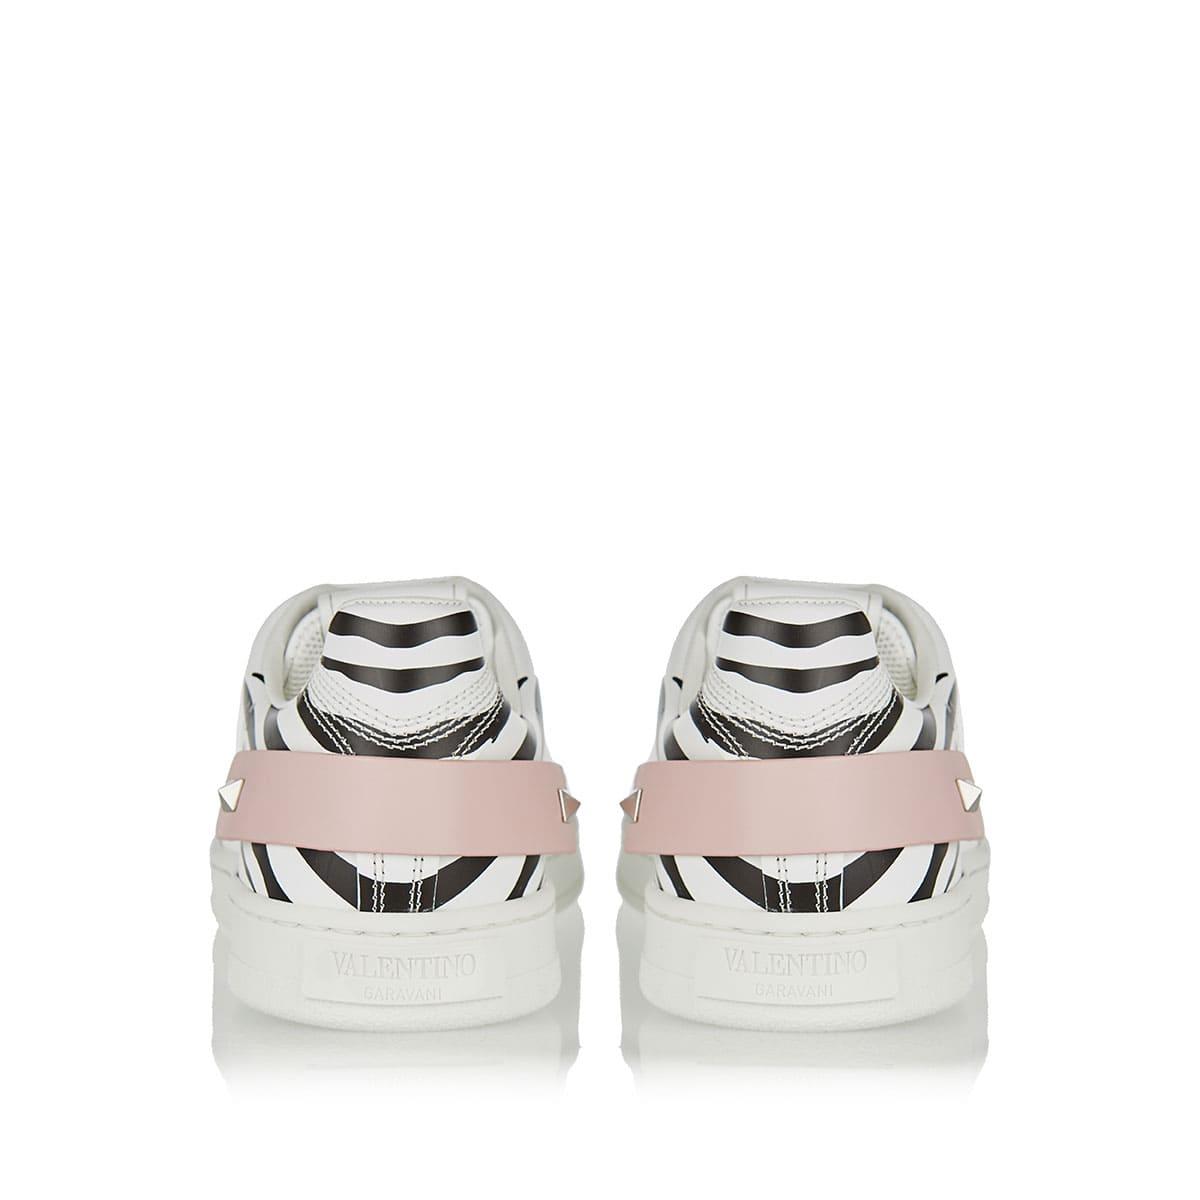 BACKNET zebra printed leather sneakers